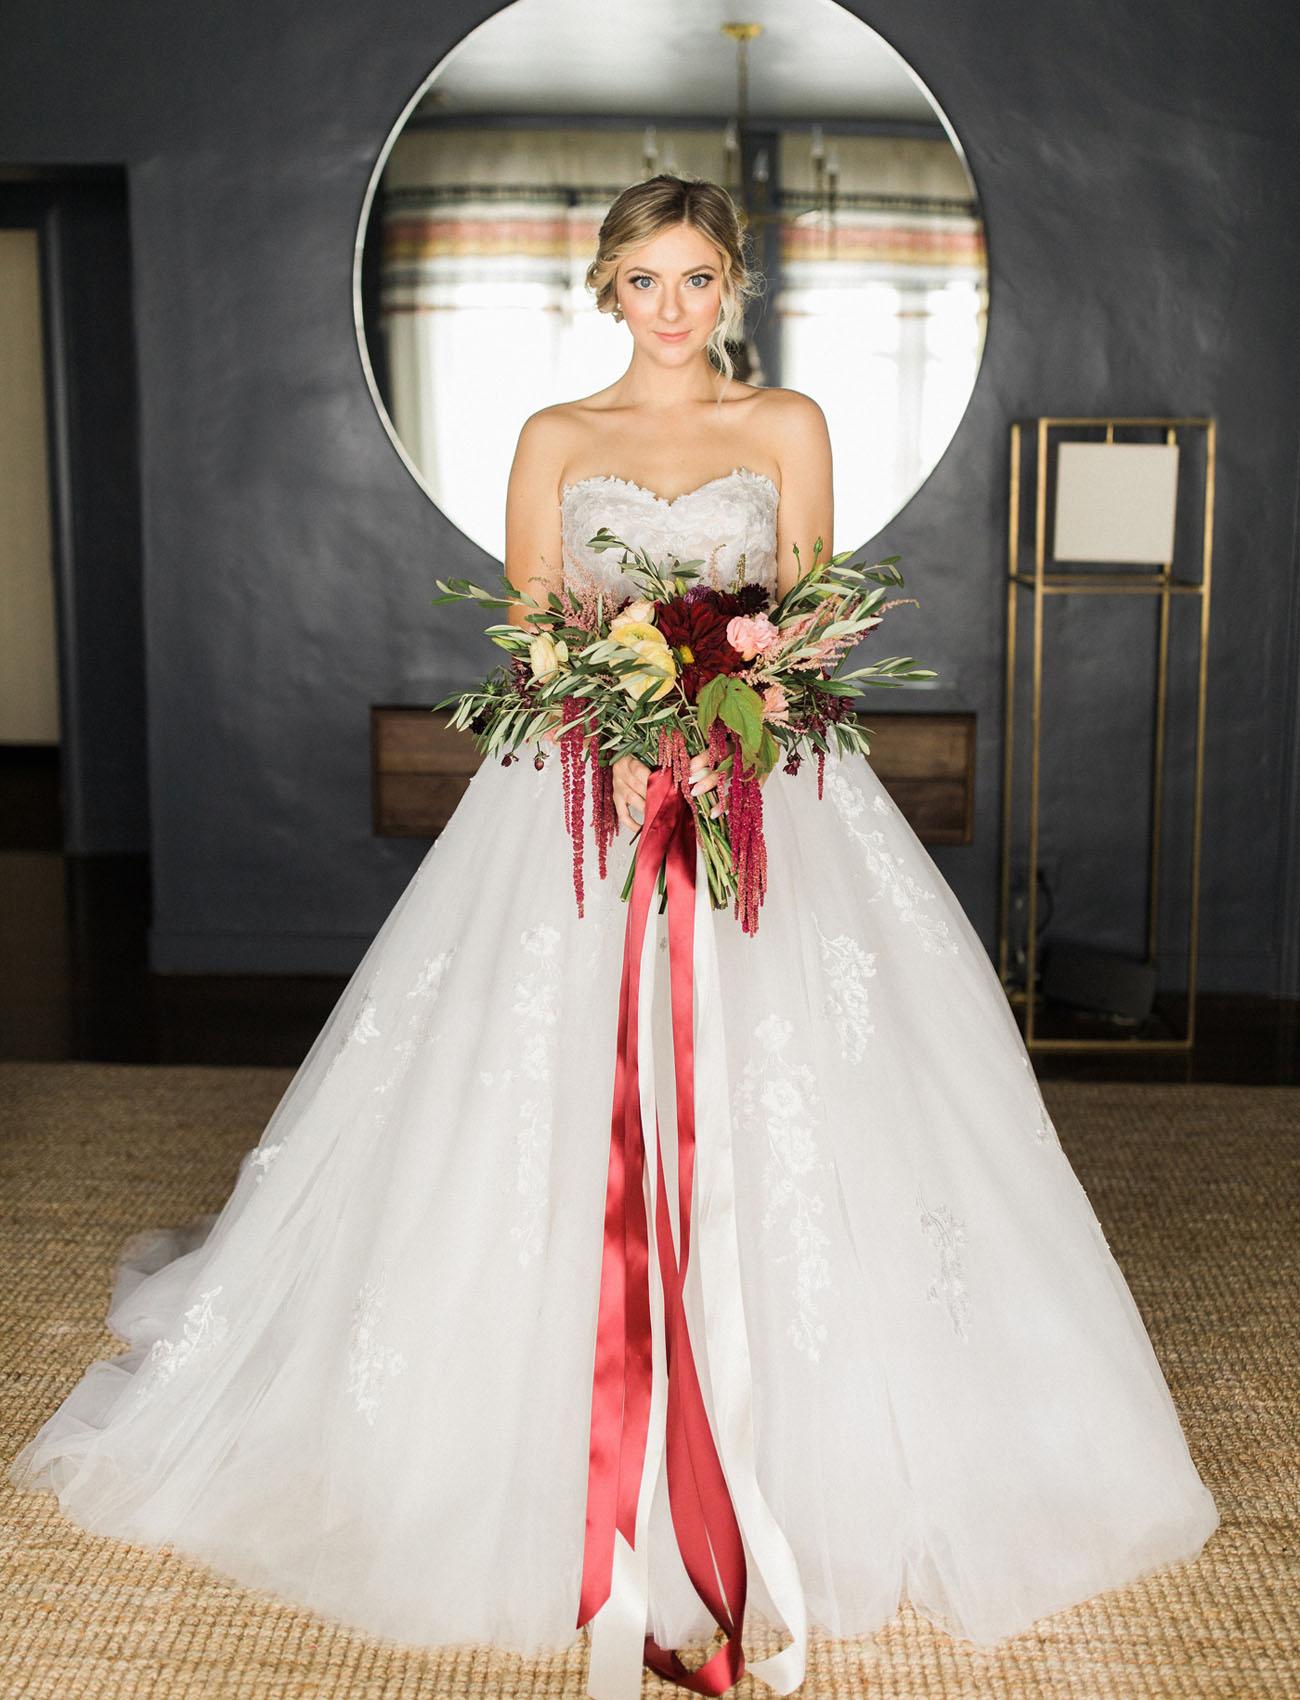 JINZA Couture Bridal wedding dress